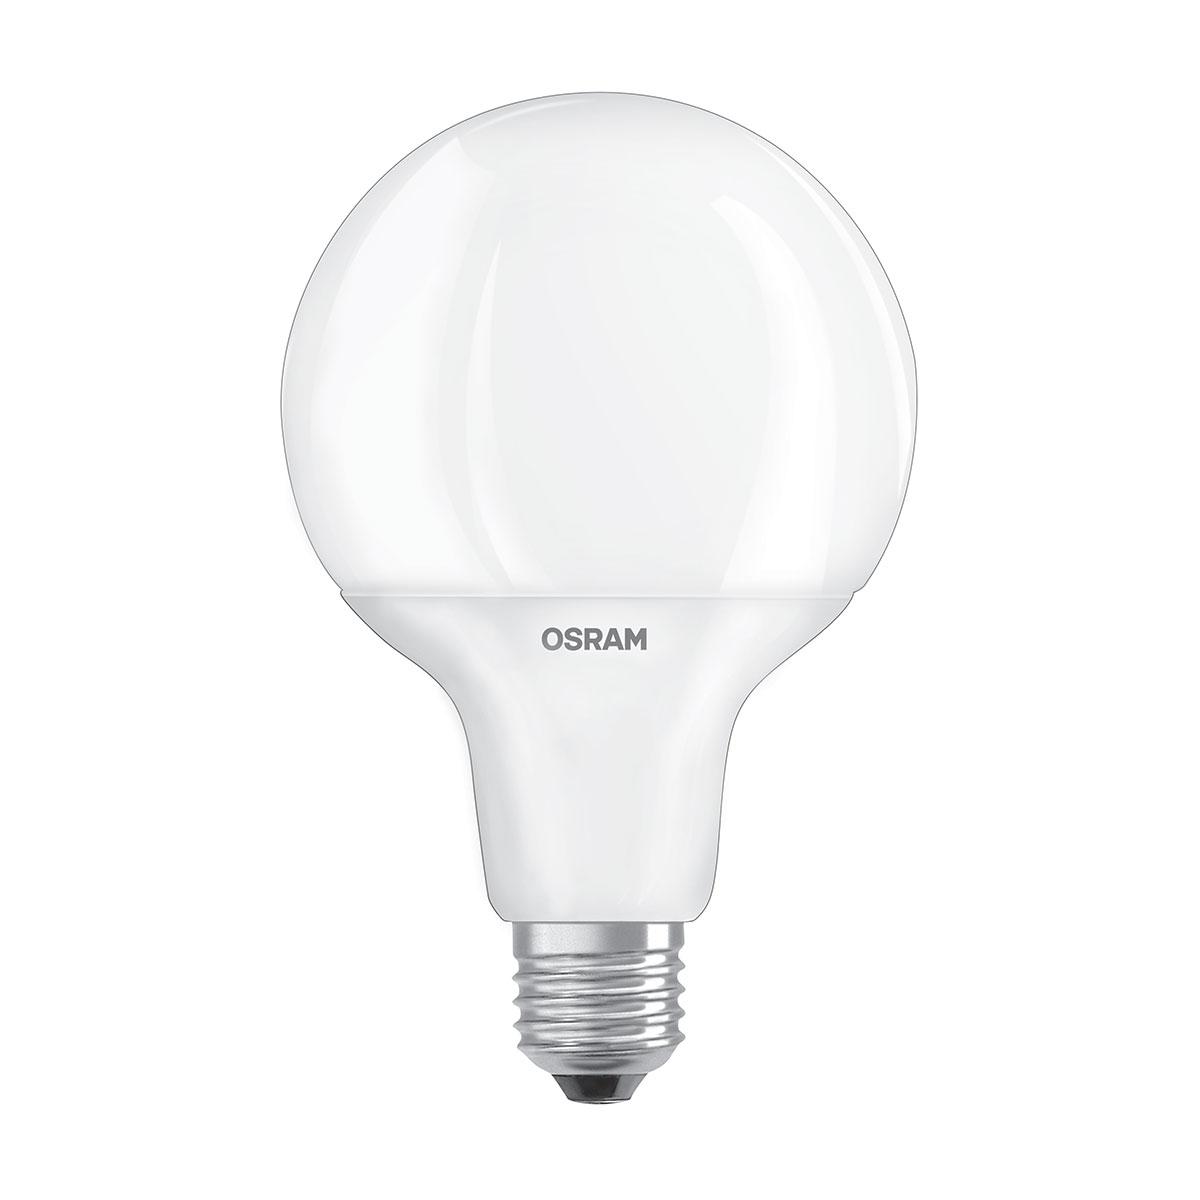 osram ampoule led star classic globe e27 9w 60w a ampoule led osram sur. Black Bedroom Furniture Sets. Home Design Ideas